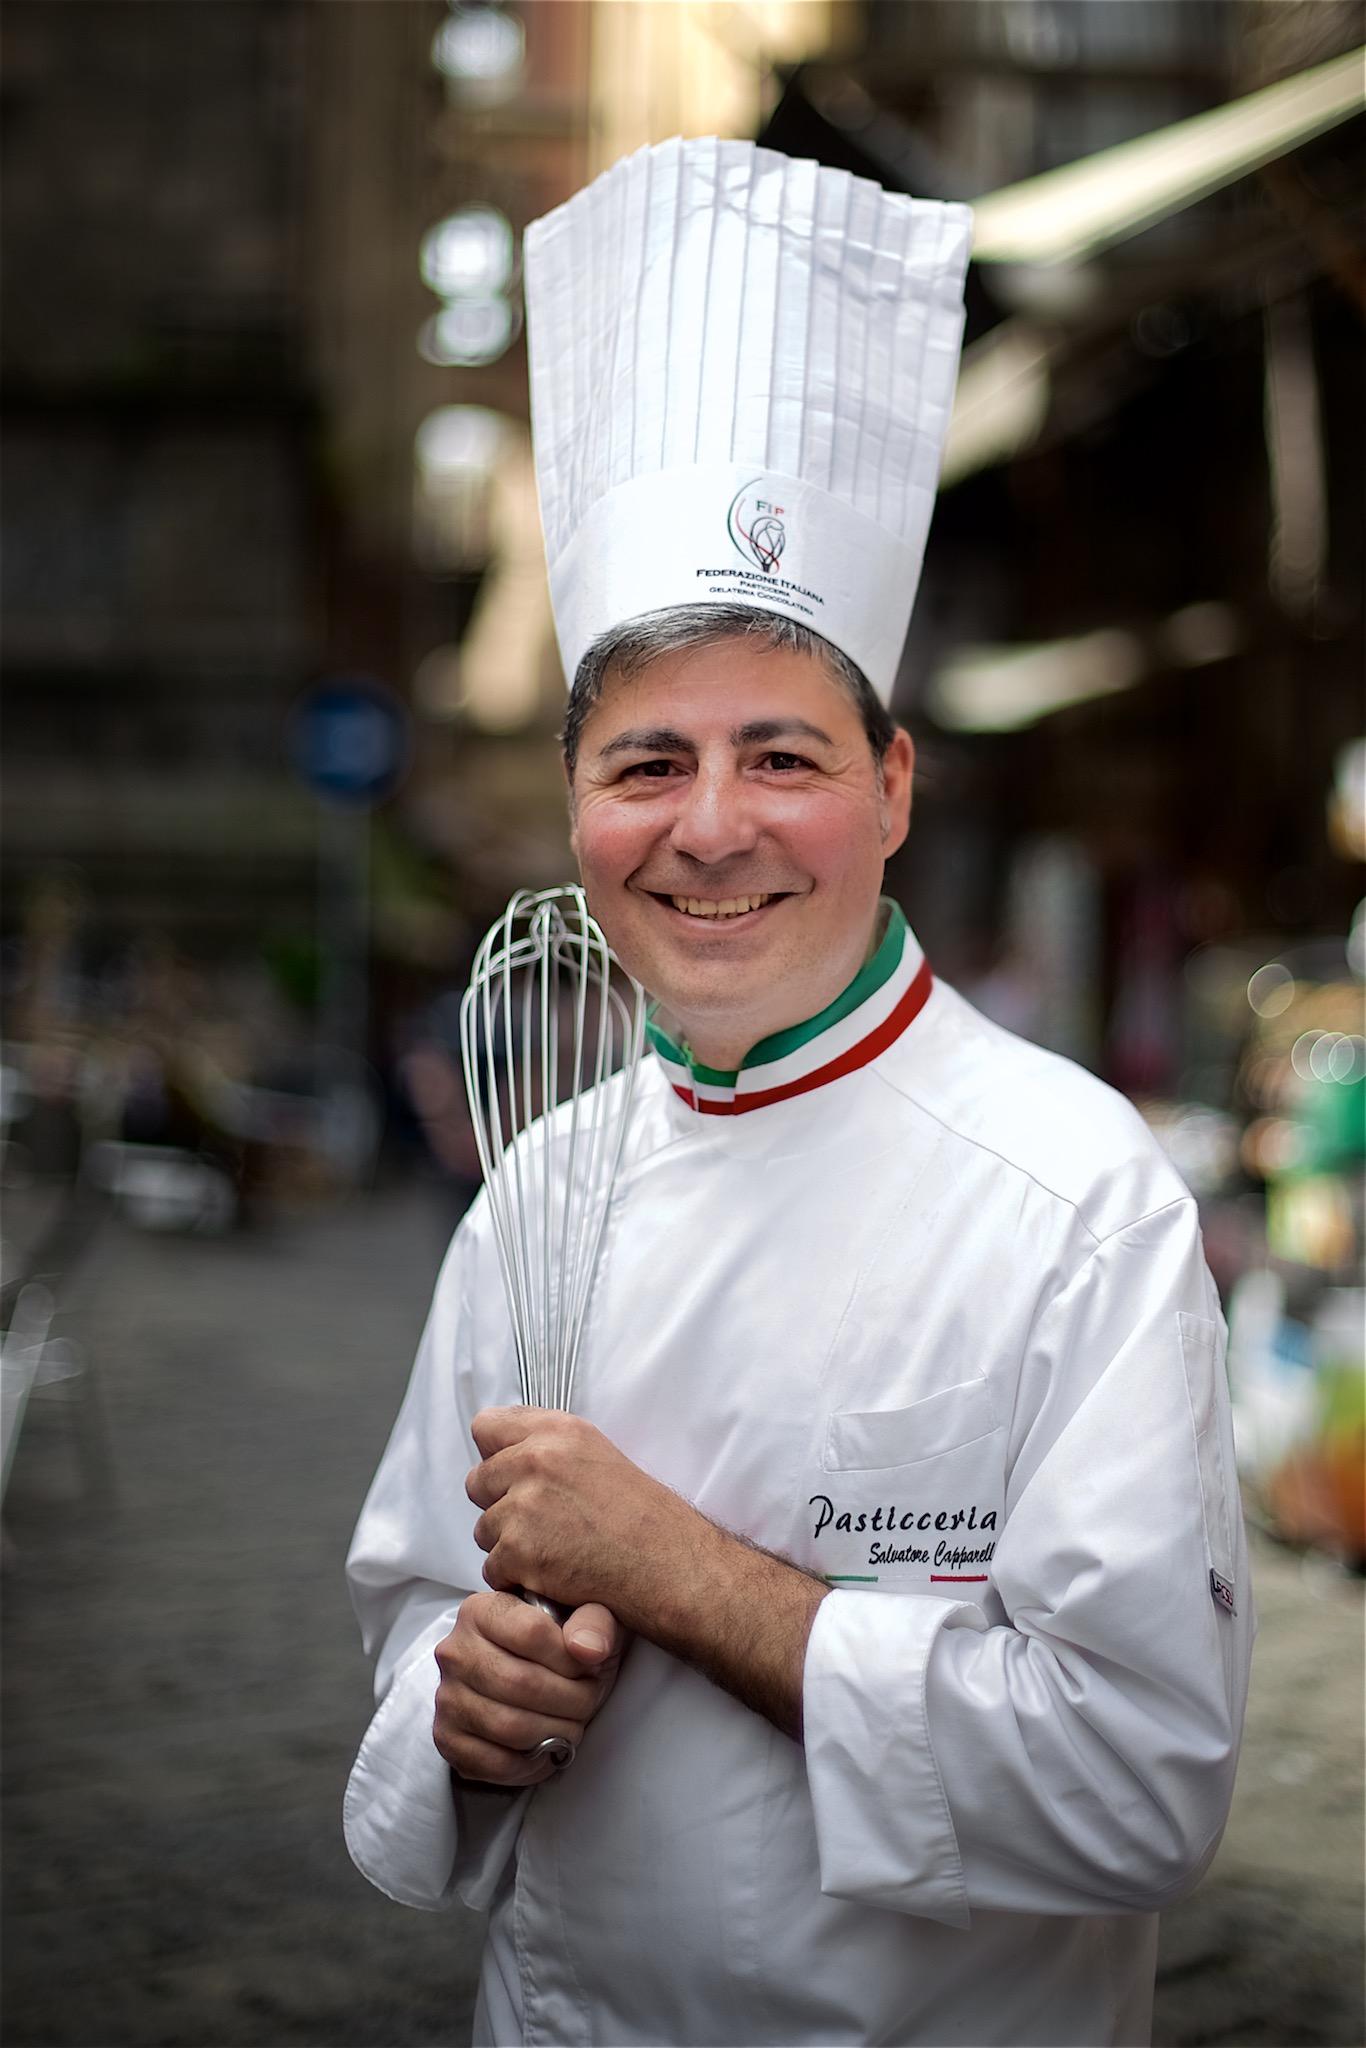 (c) 2016 Luciano Furia www.lucianofuria.com